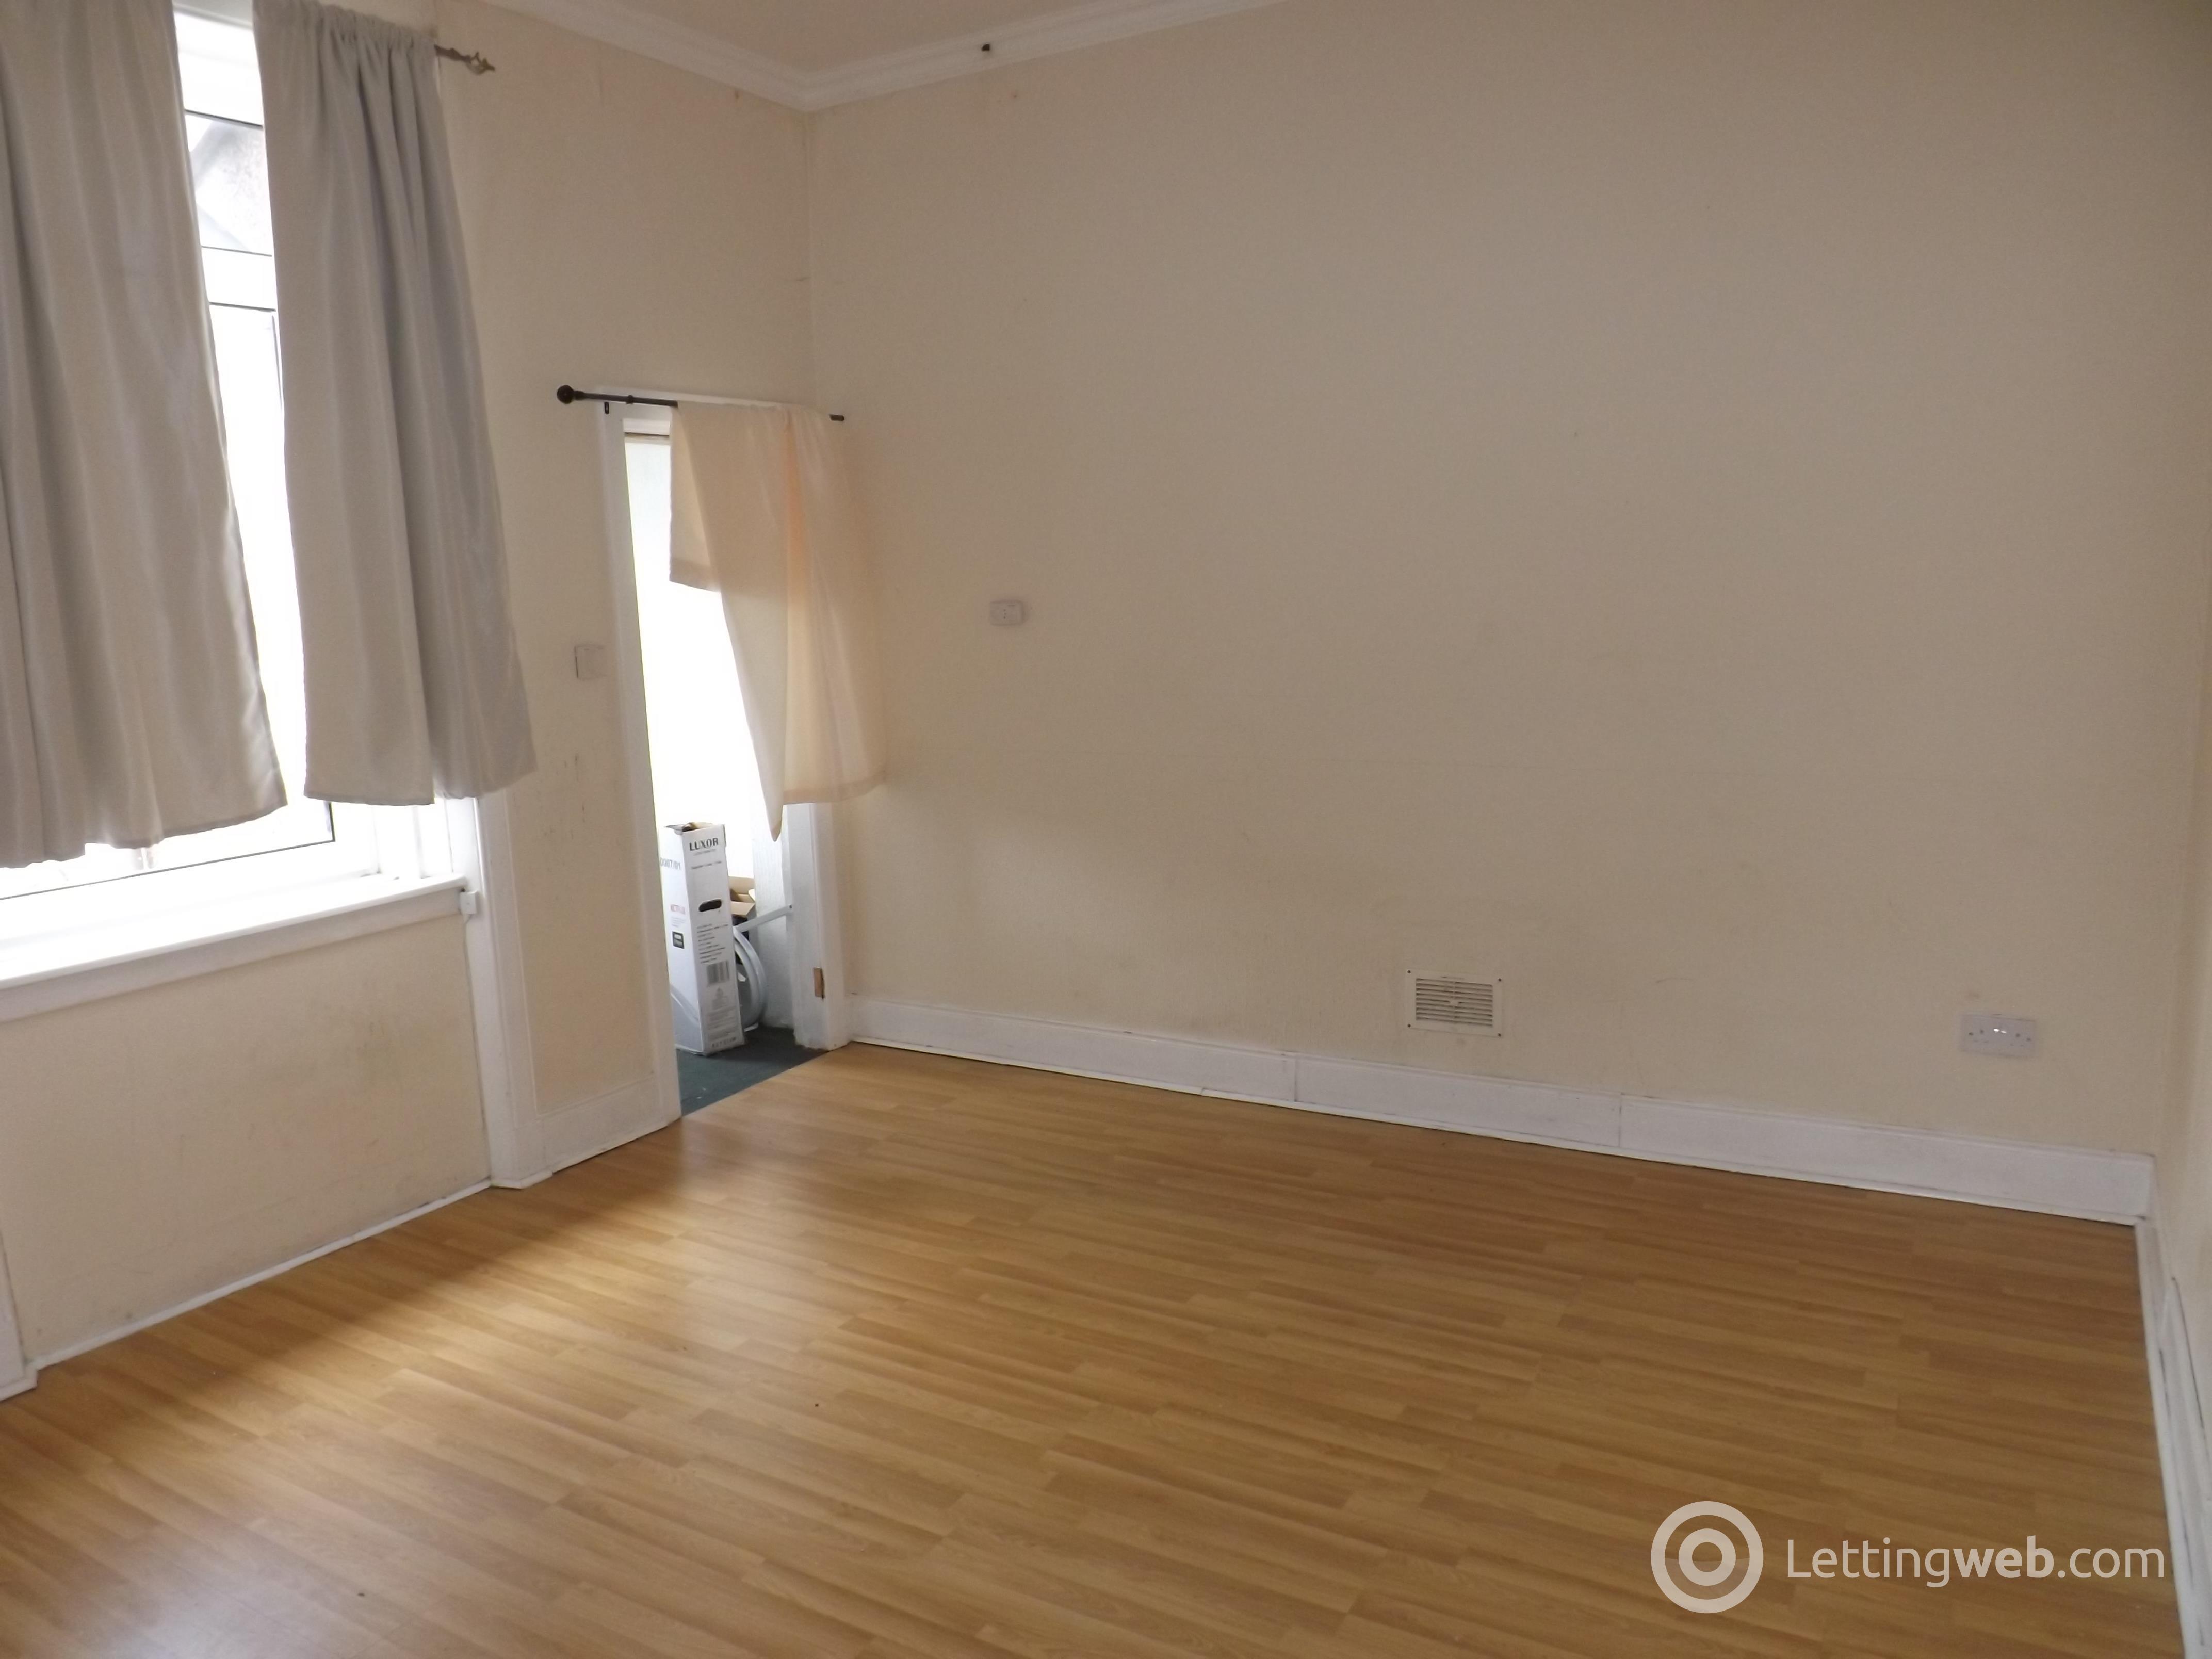 Property to rent in Low Glencairn Street, Kilmarnock, Ayrshire, KA1 4DQ